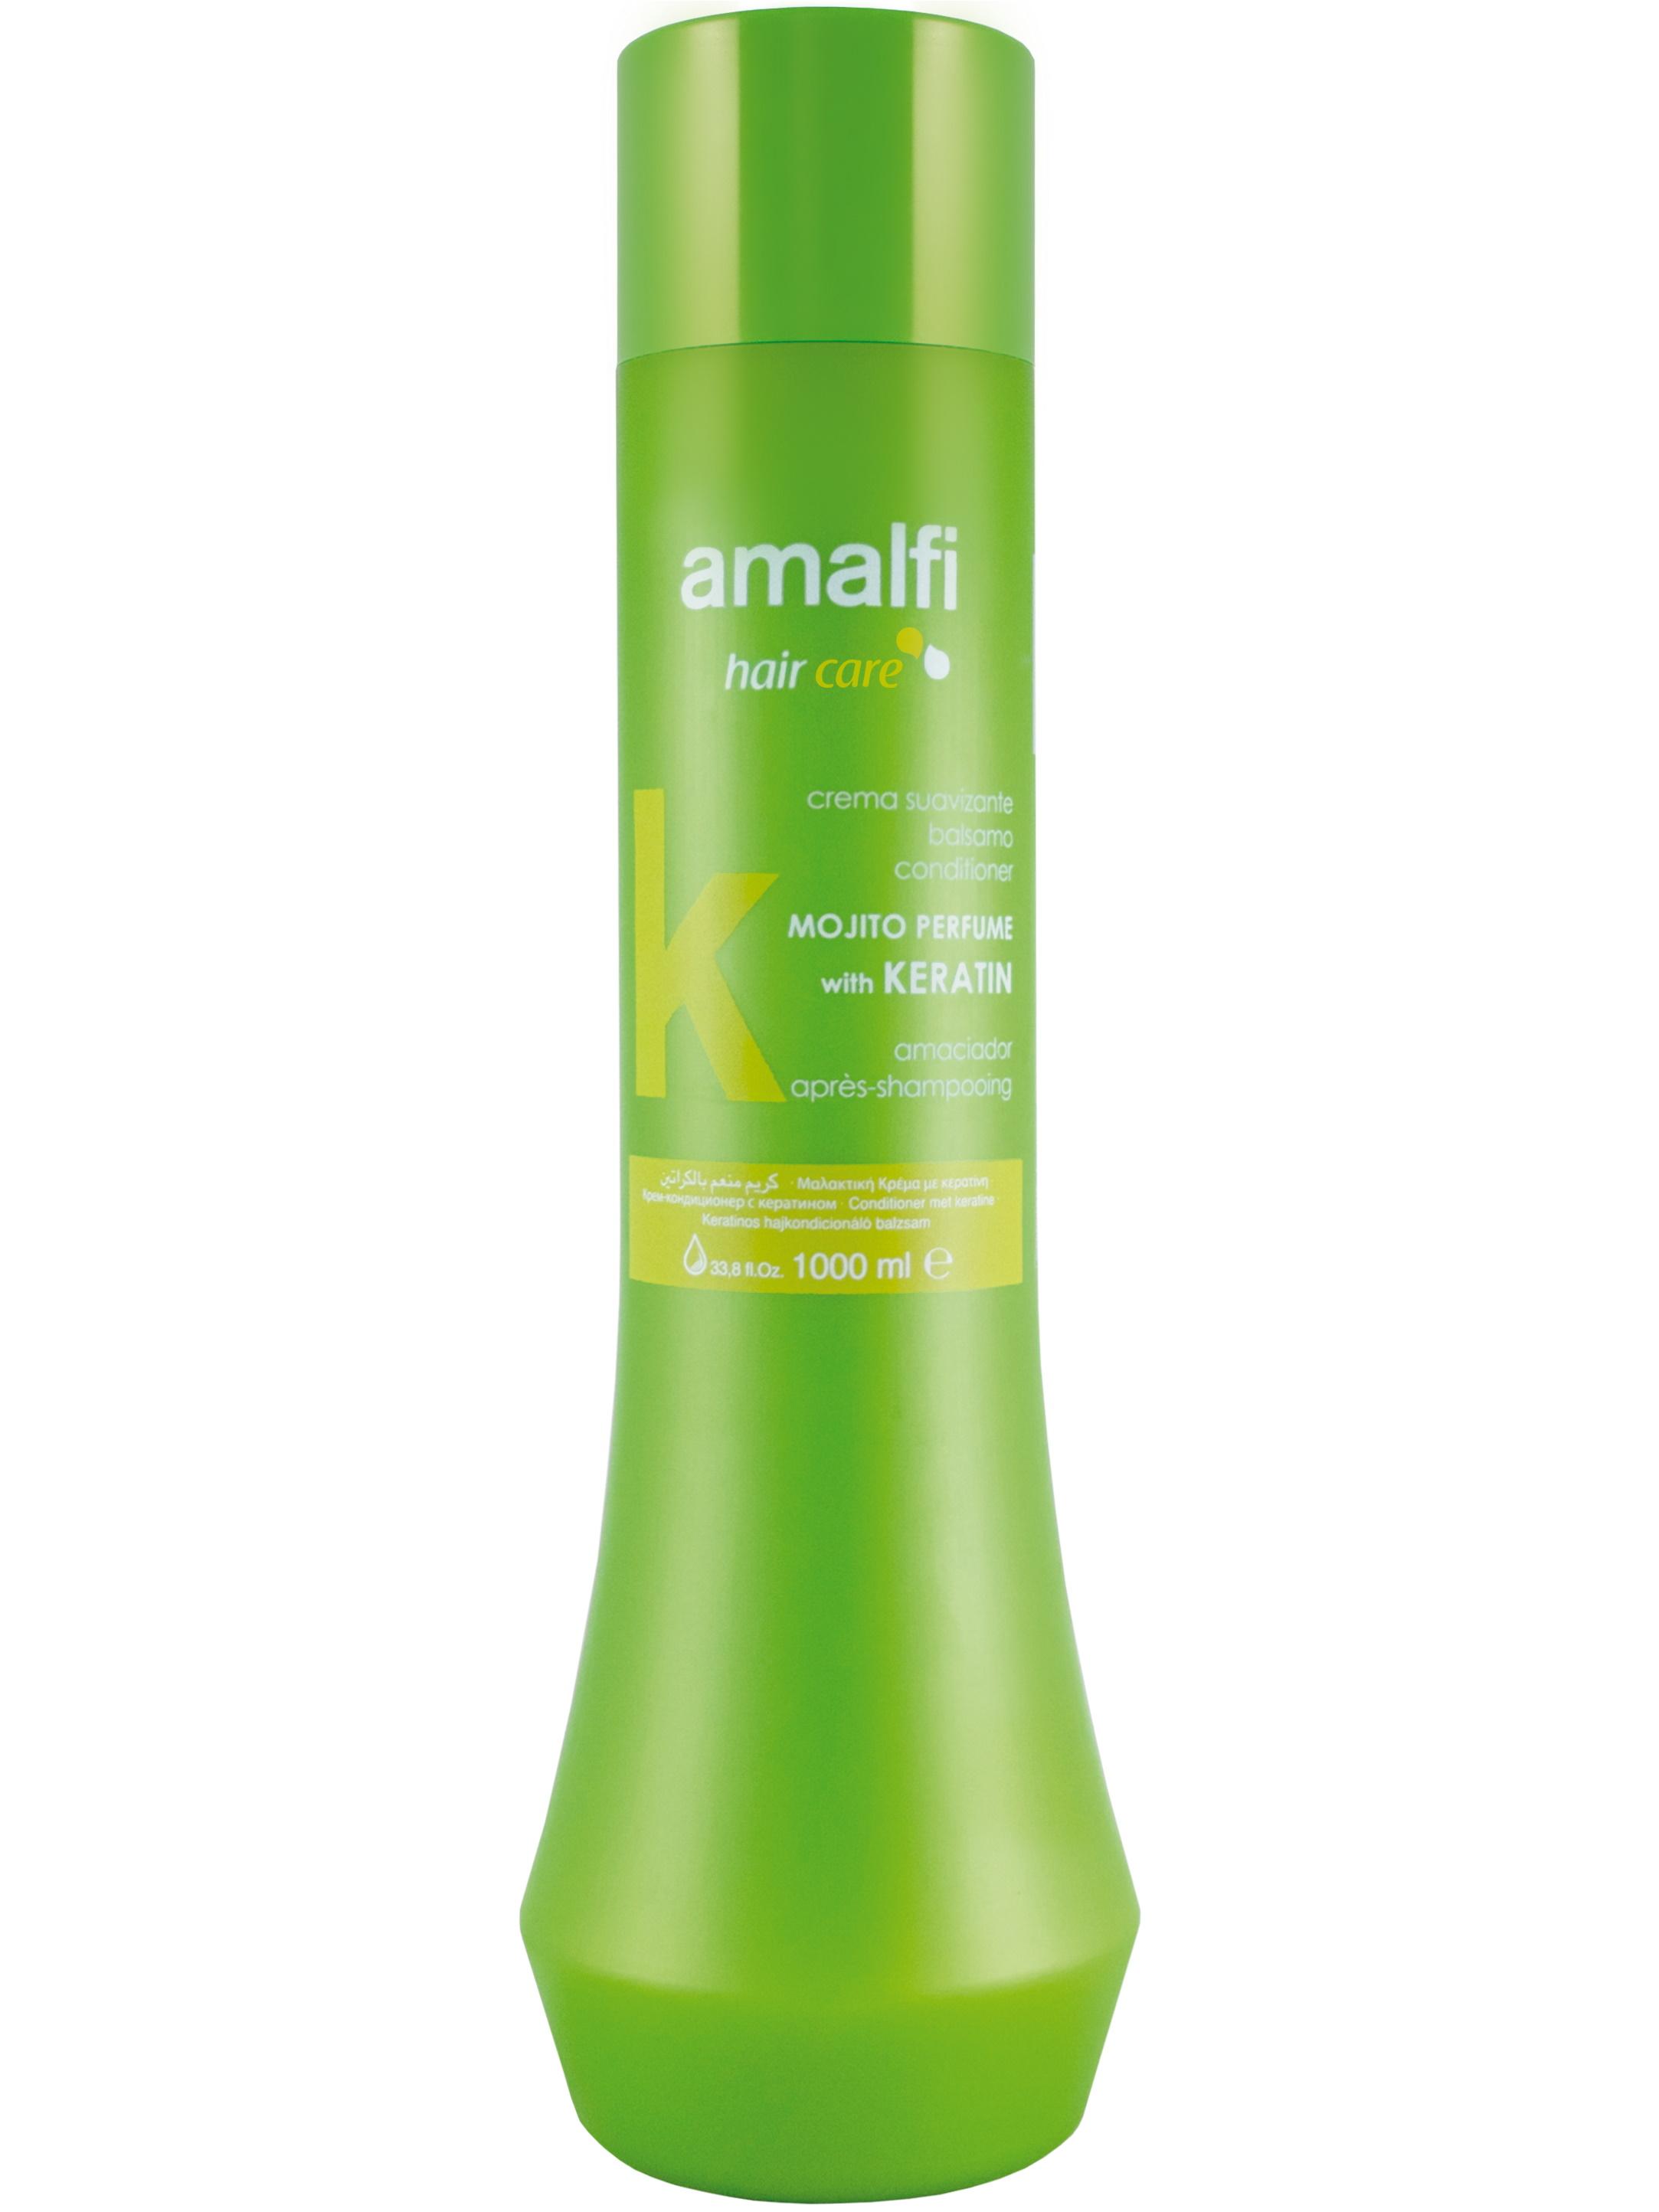 Купить Кондиционер для ухода за волосами AMALFI с кератином mojito 1000 мл, Amalfy